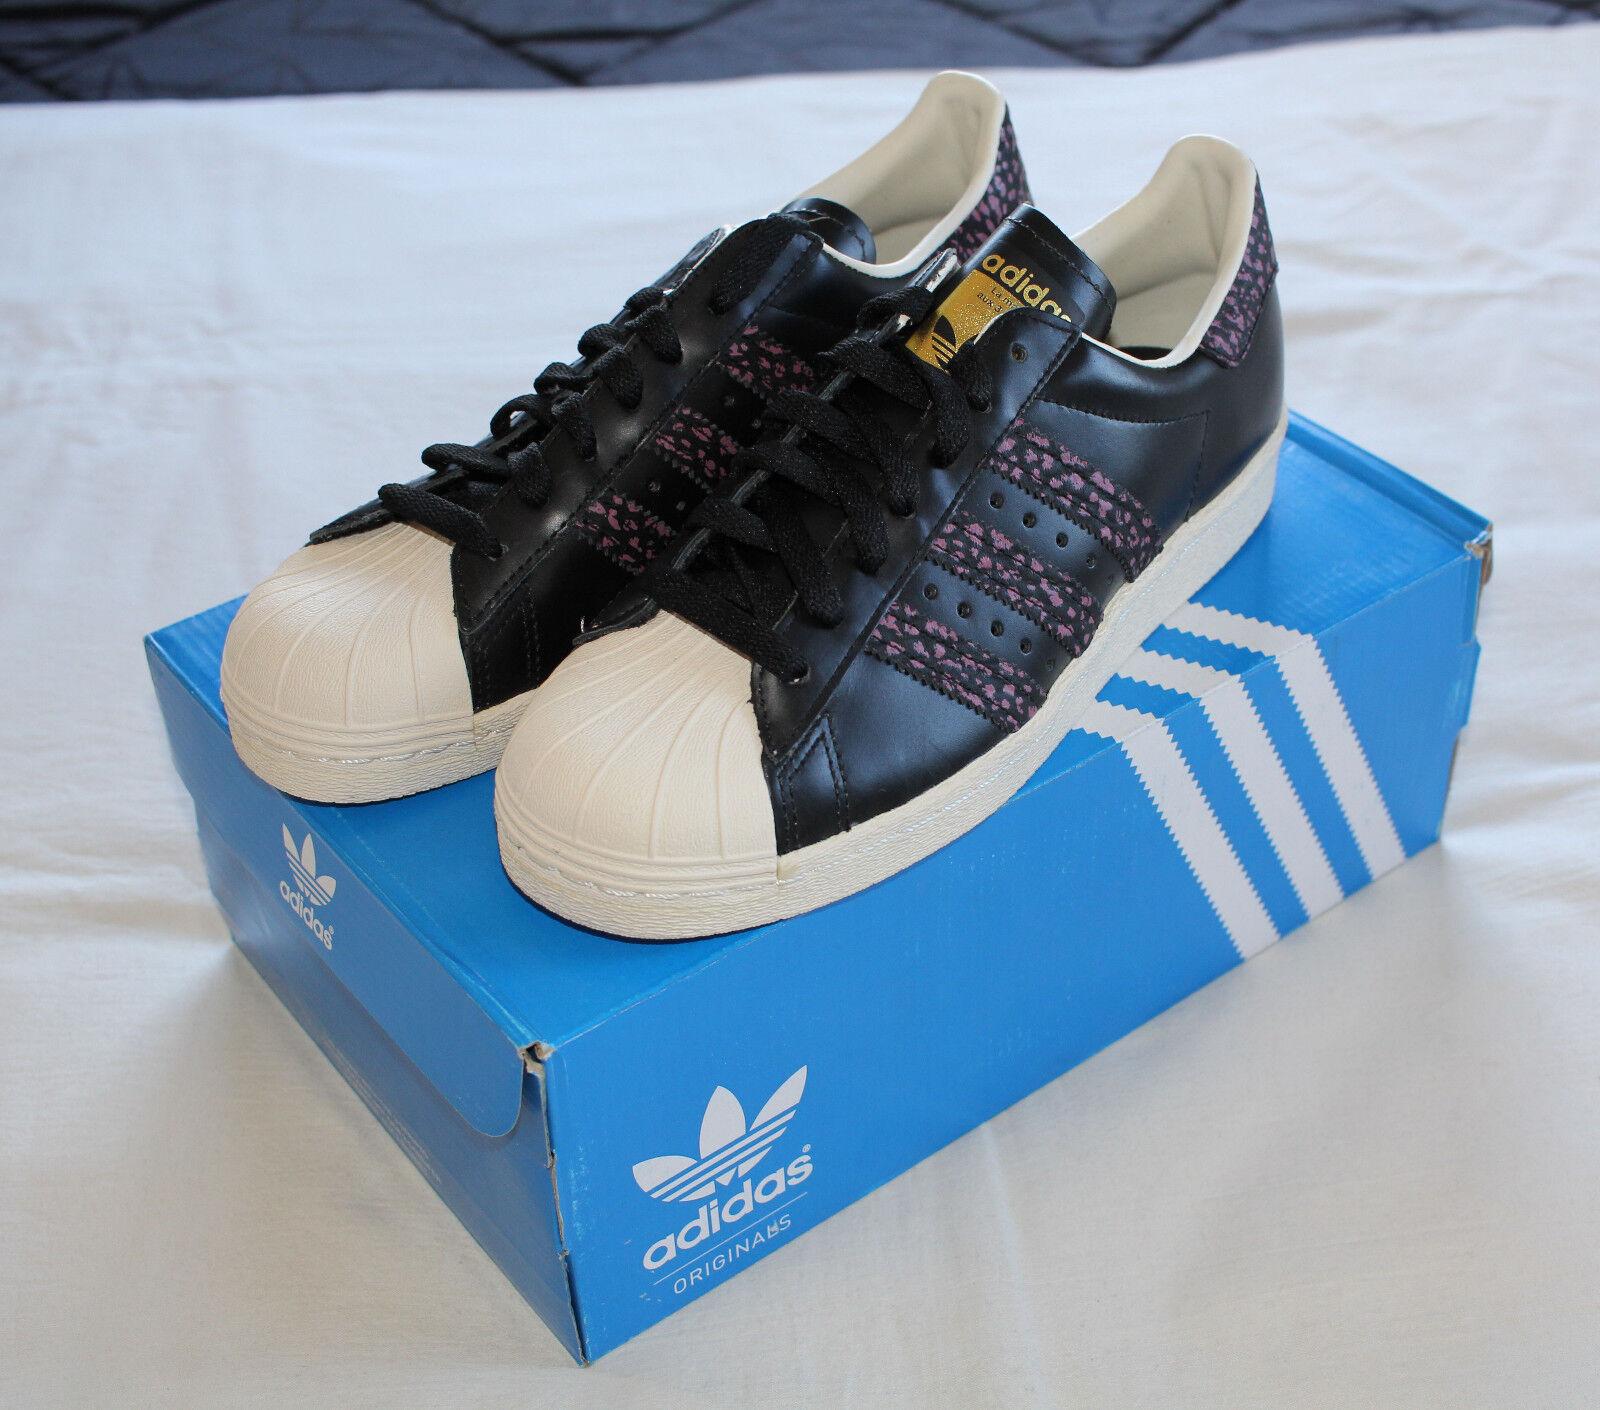 Adidas Originals S75846 Superstar 80s Black Pink White Trainers Mens Size US 6